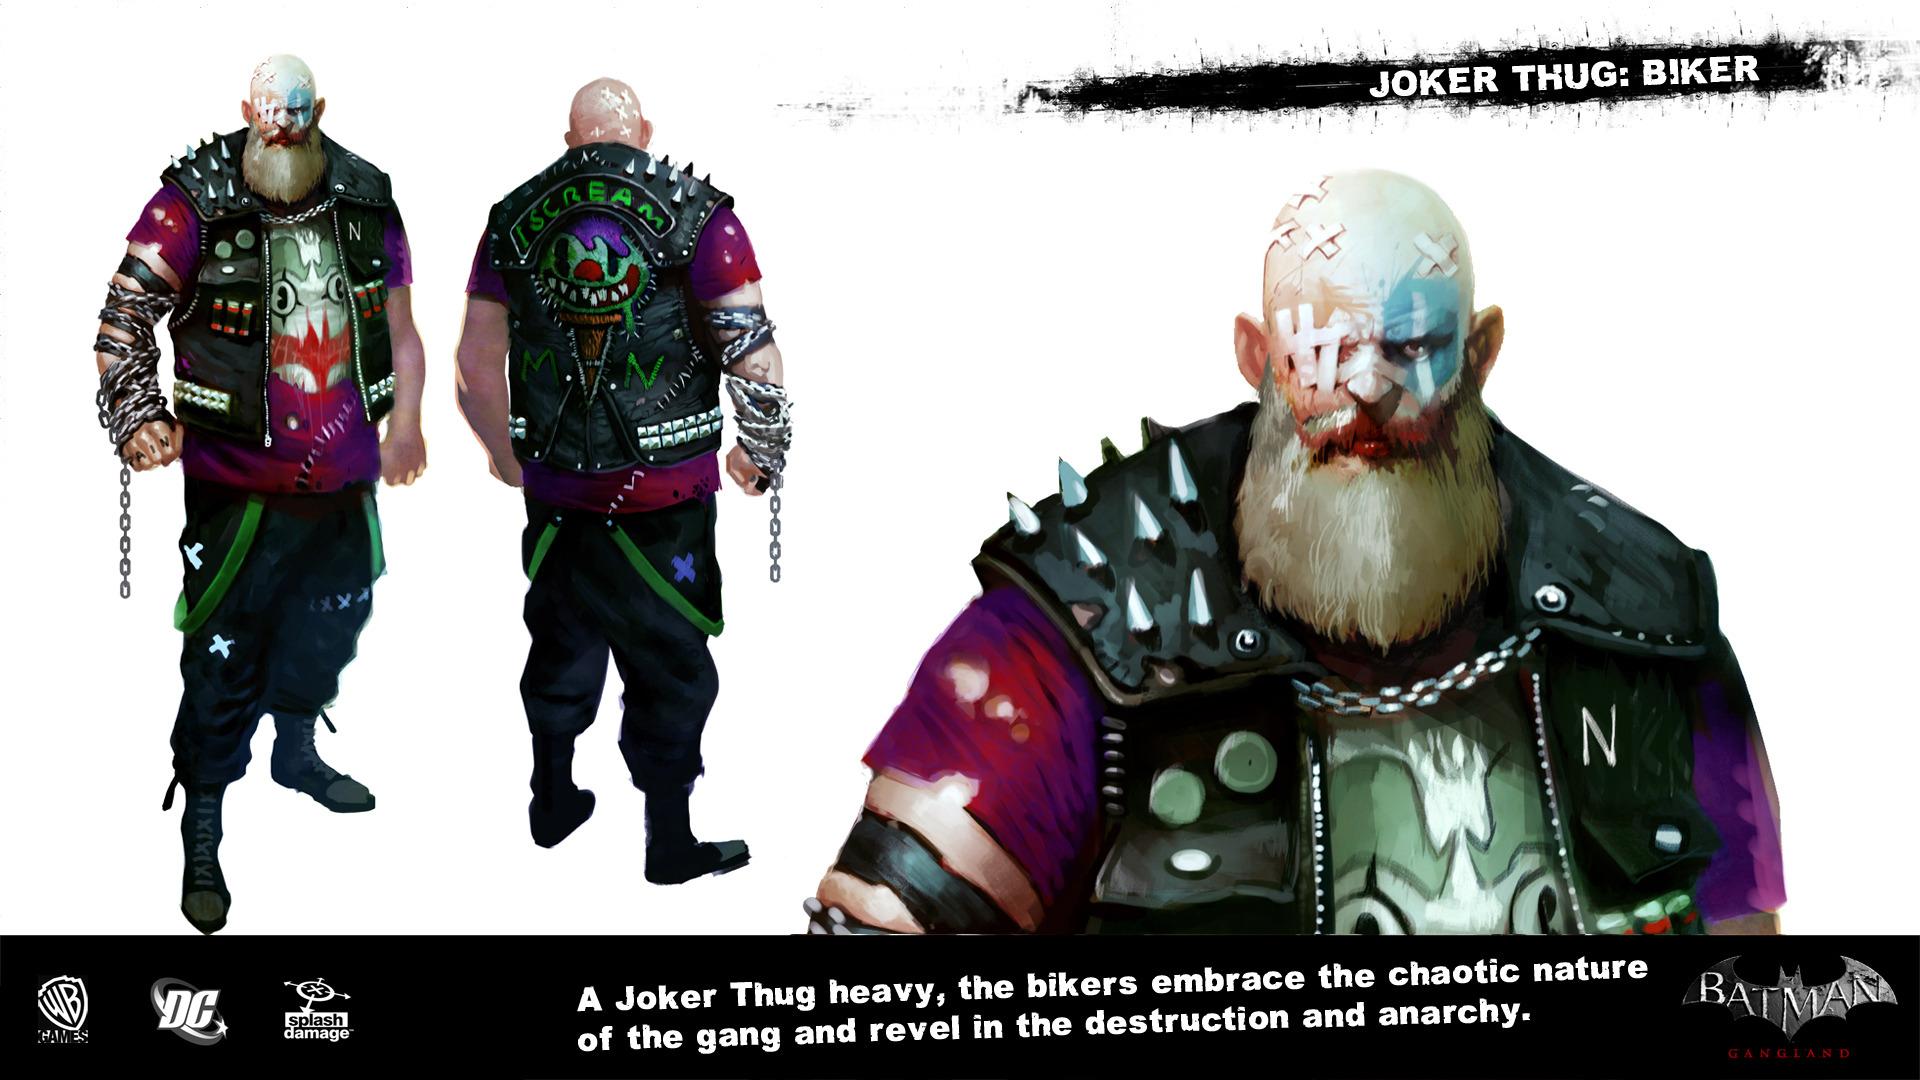 lego batman arkham origins joker Quotes